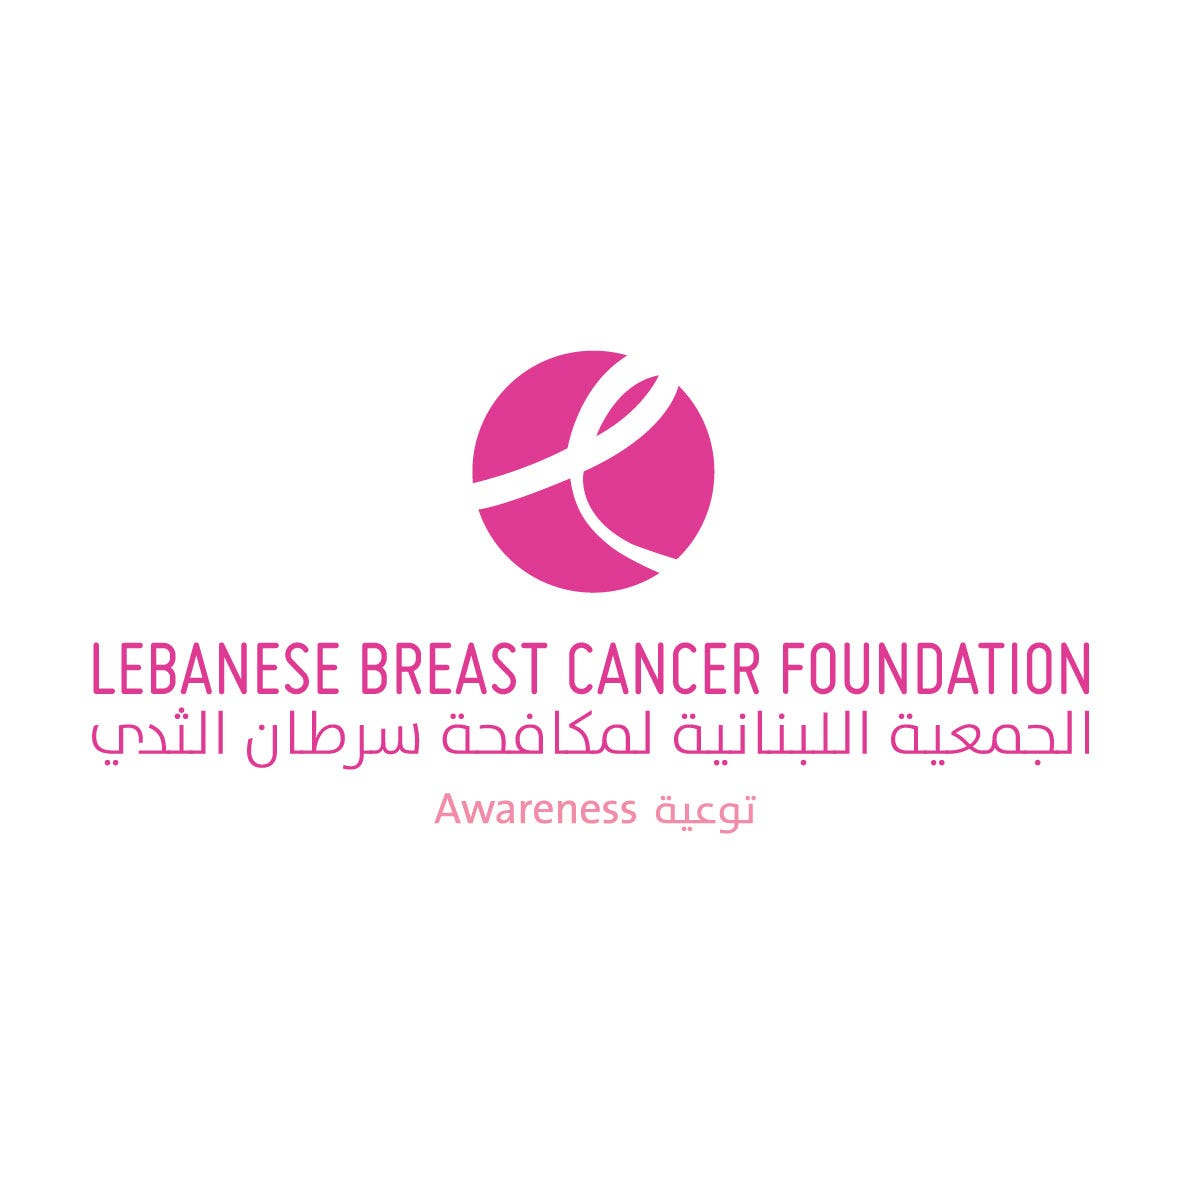 Lebanese Breast Cancer Foundation